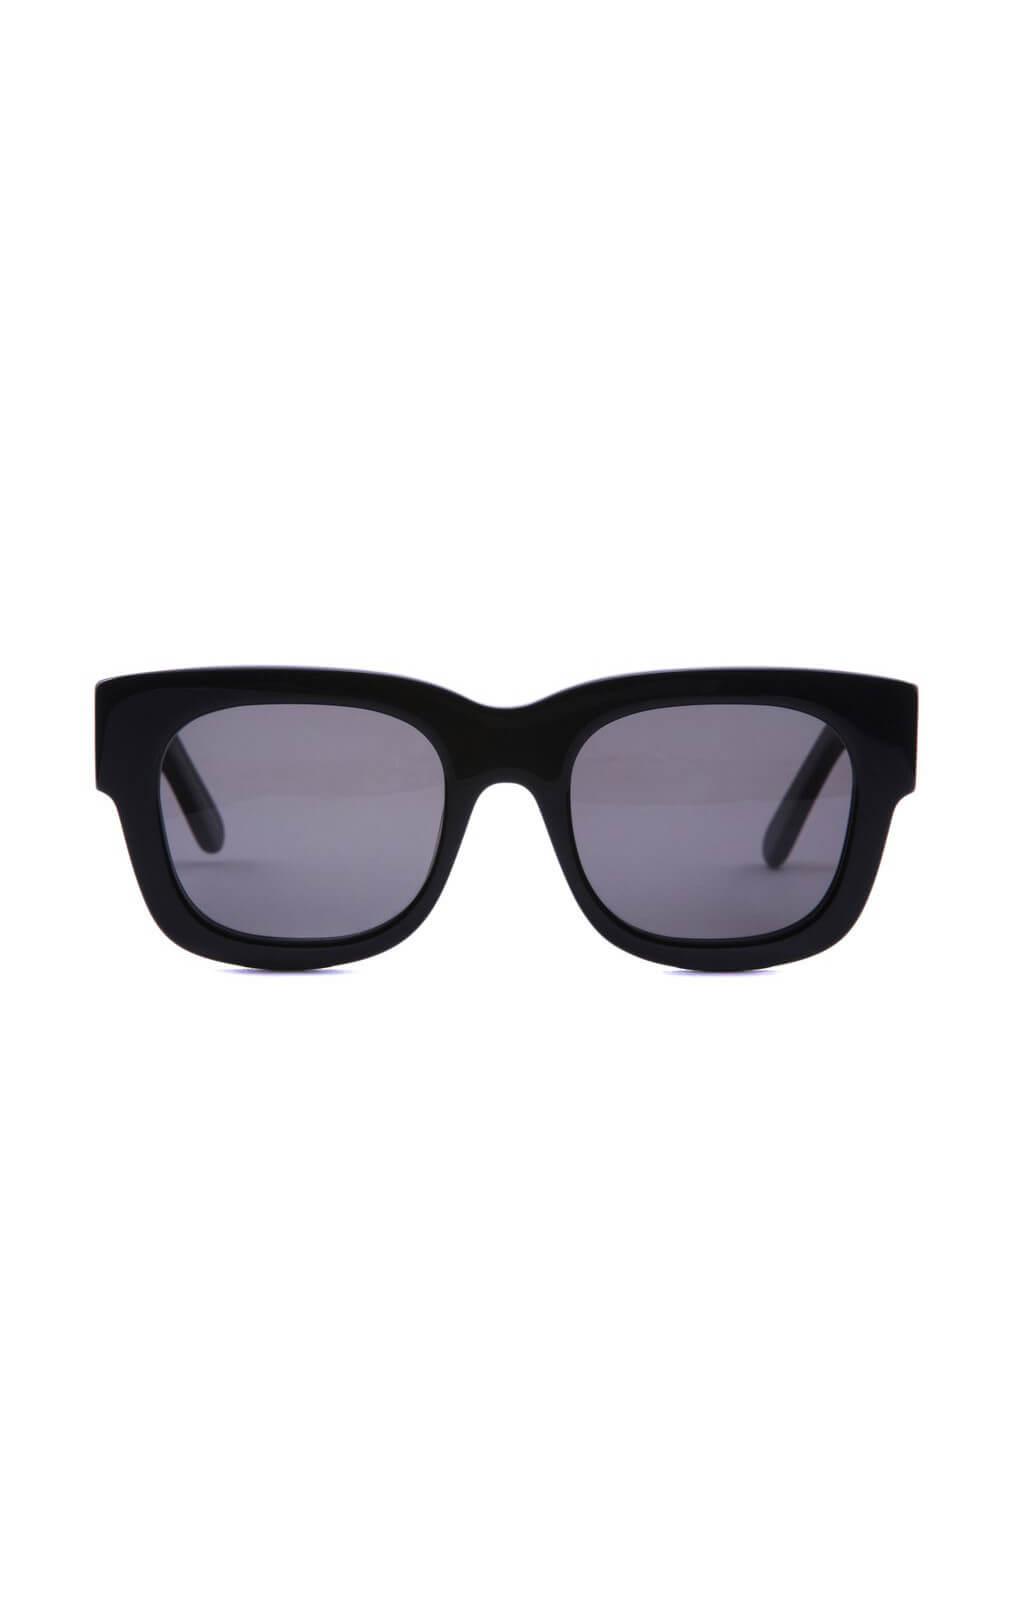 valley eyewear parasitos sunglasses black gloss